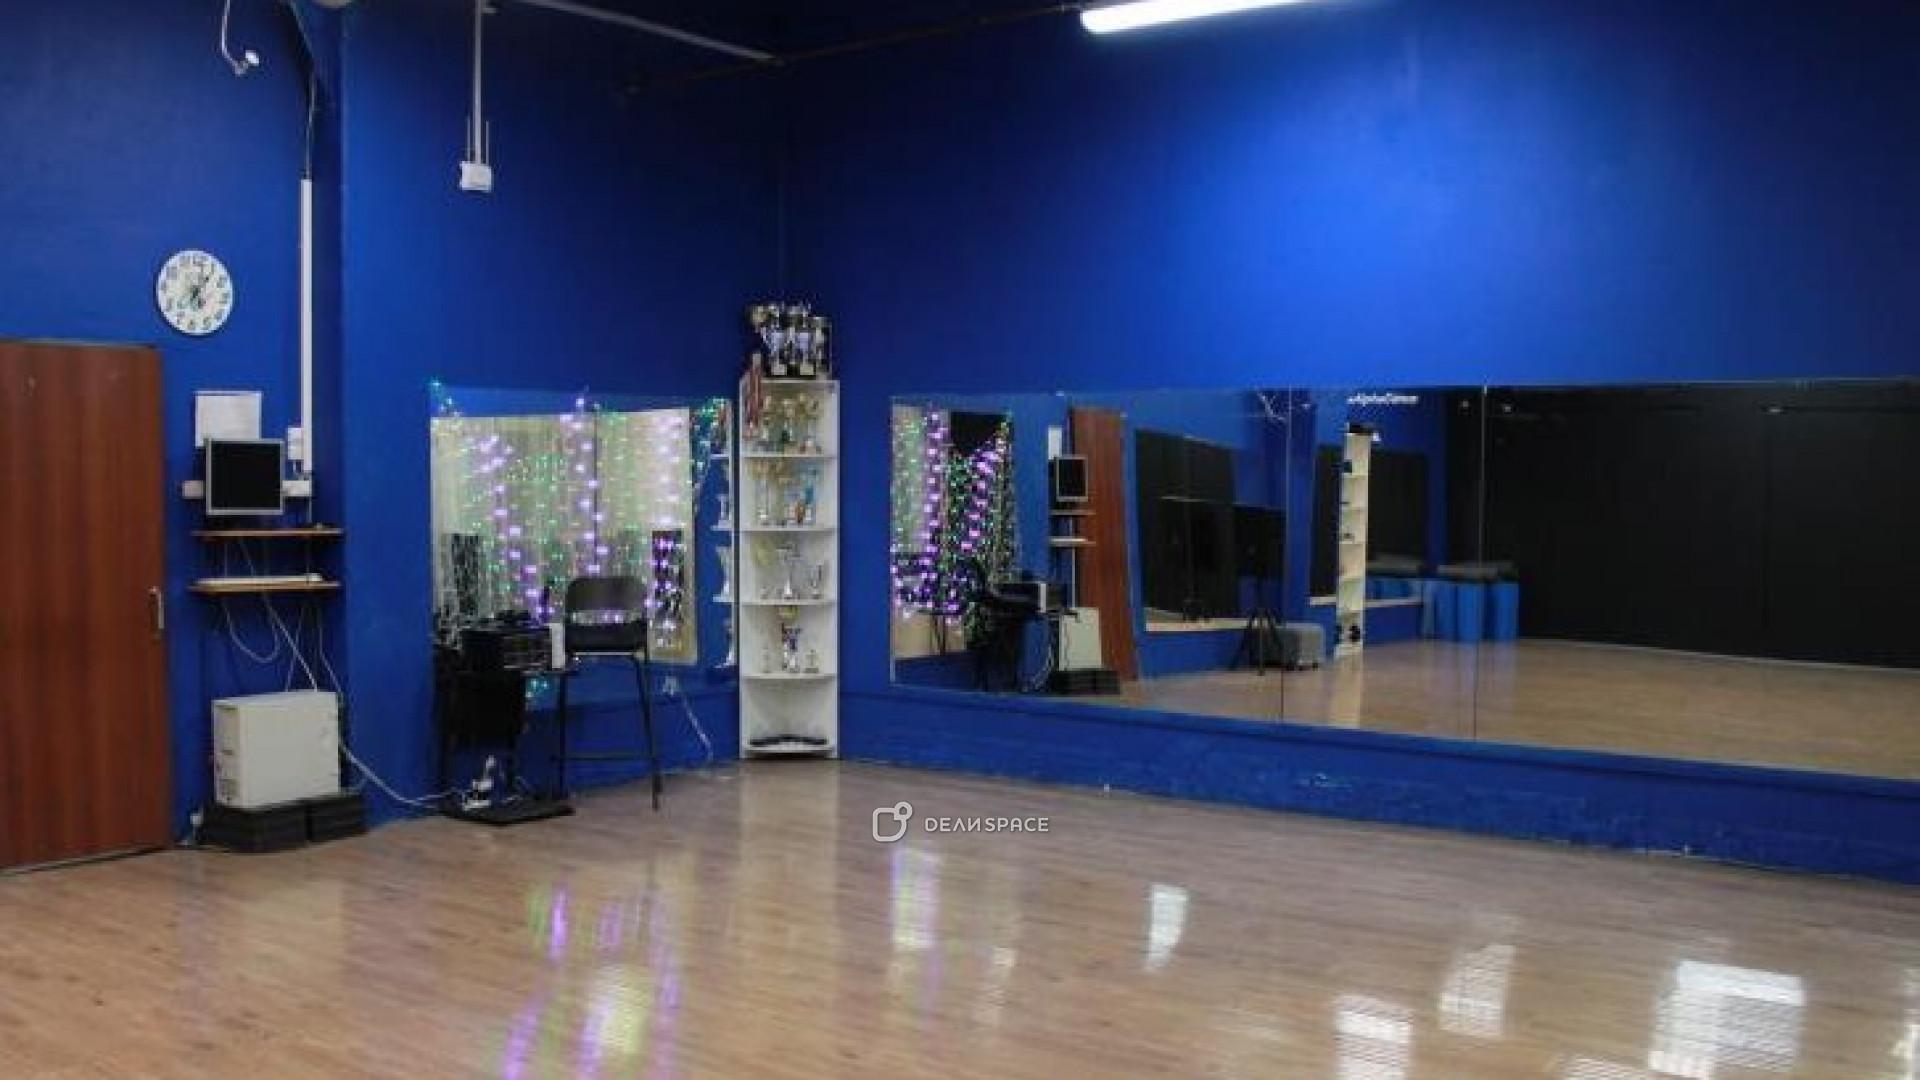 Большой (синий) зал для танцев - фото №4